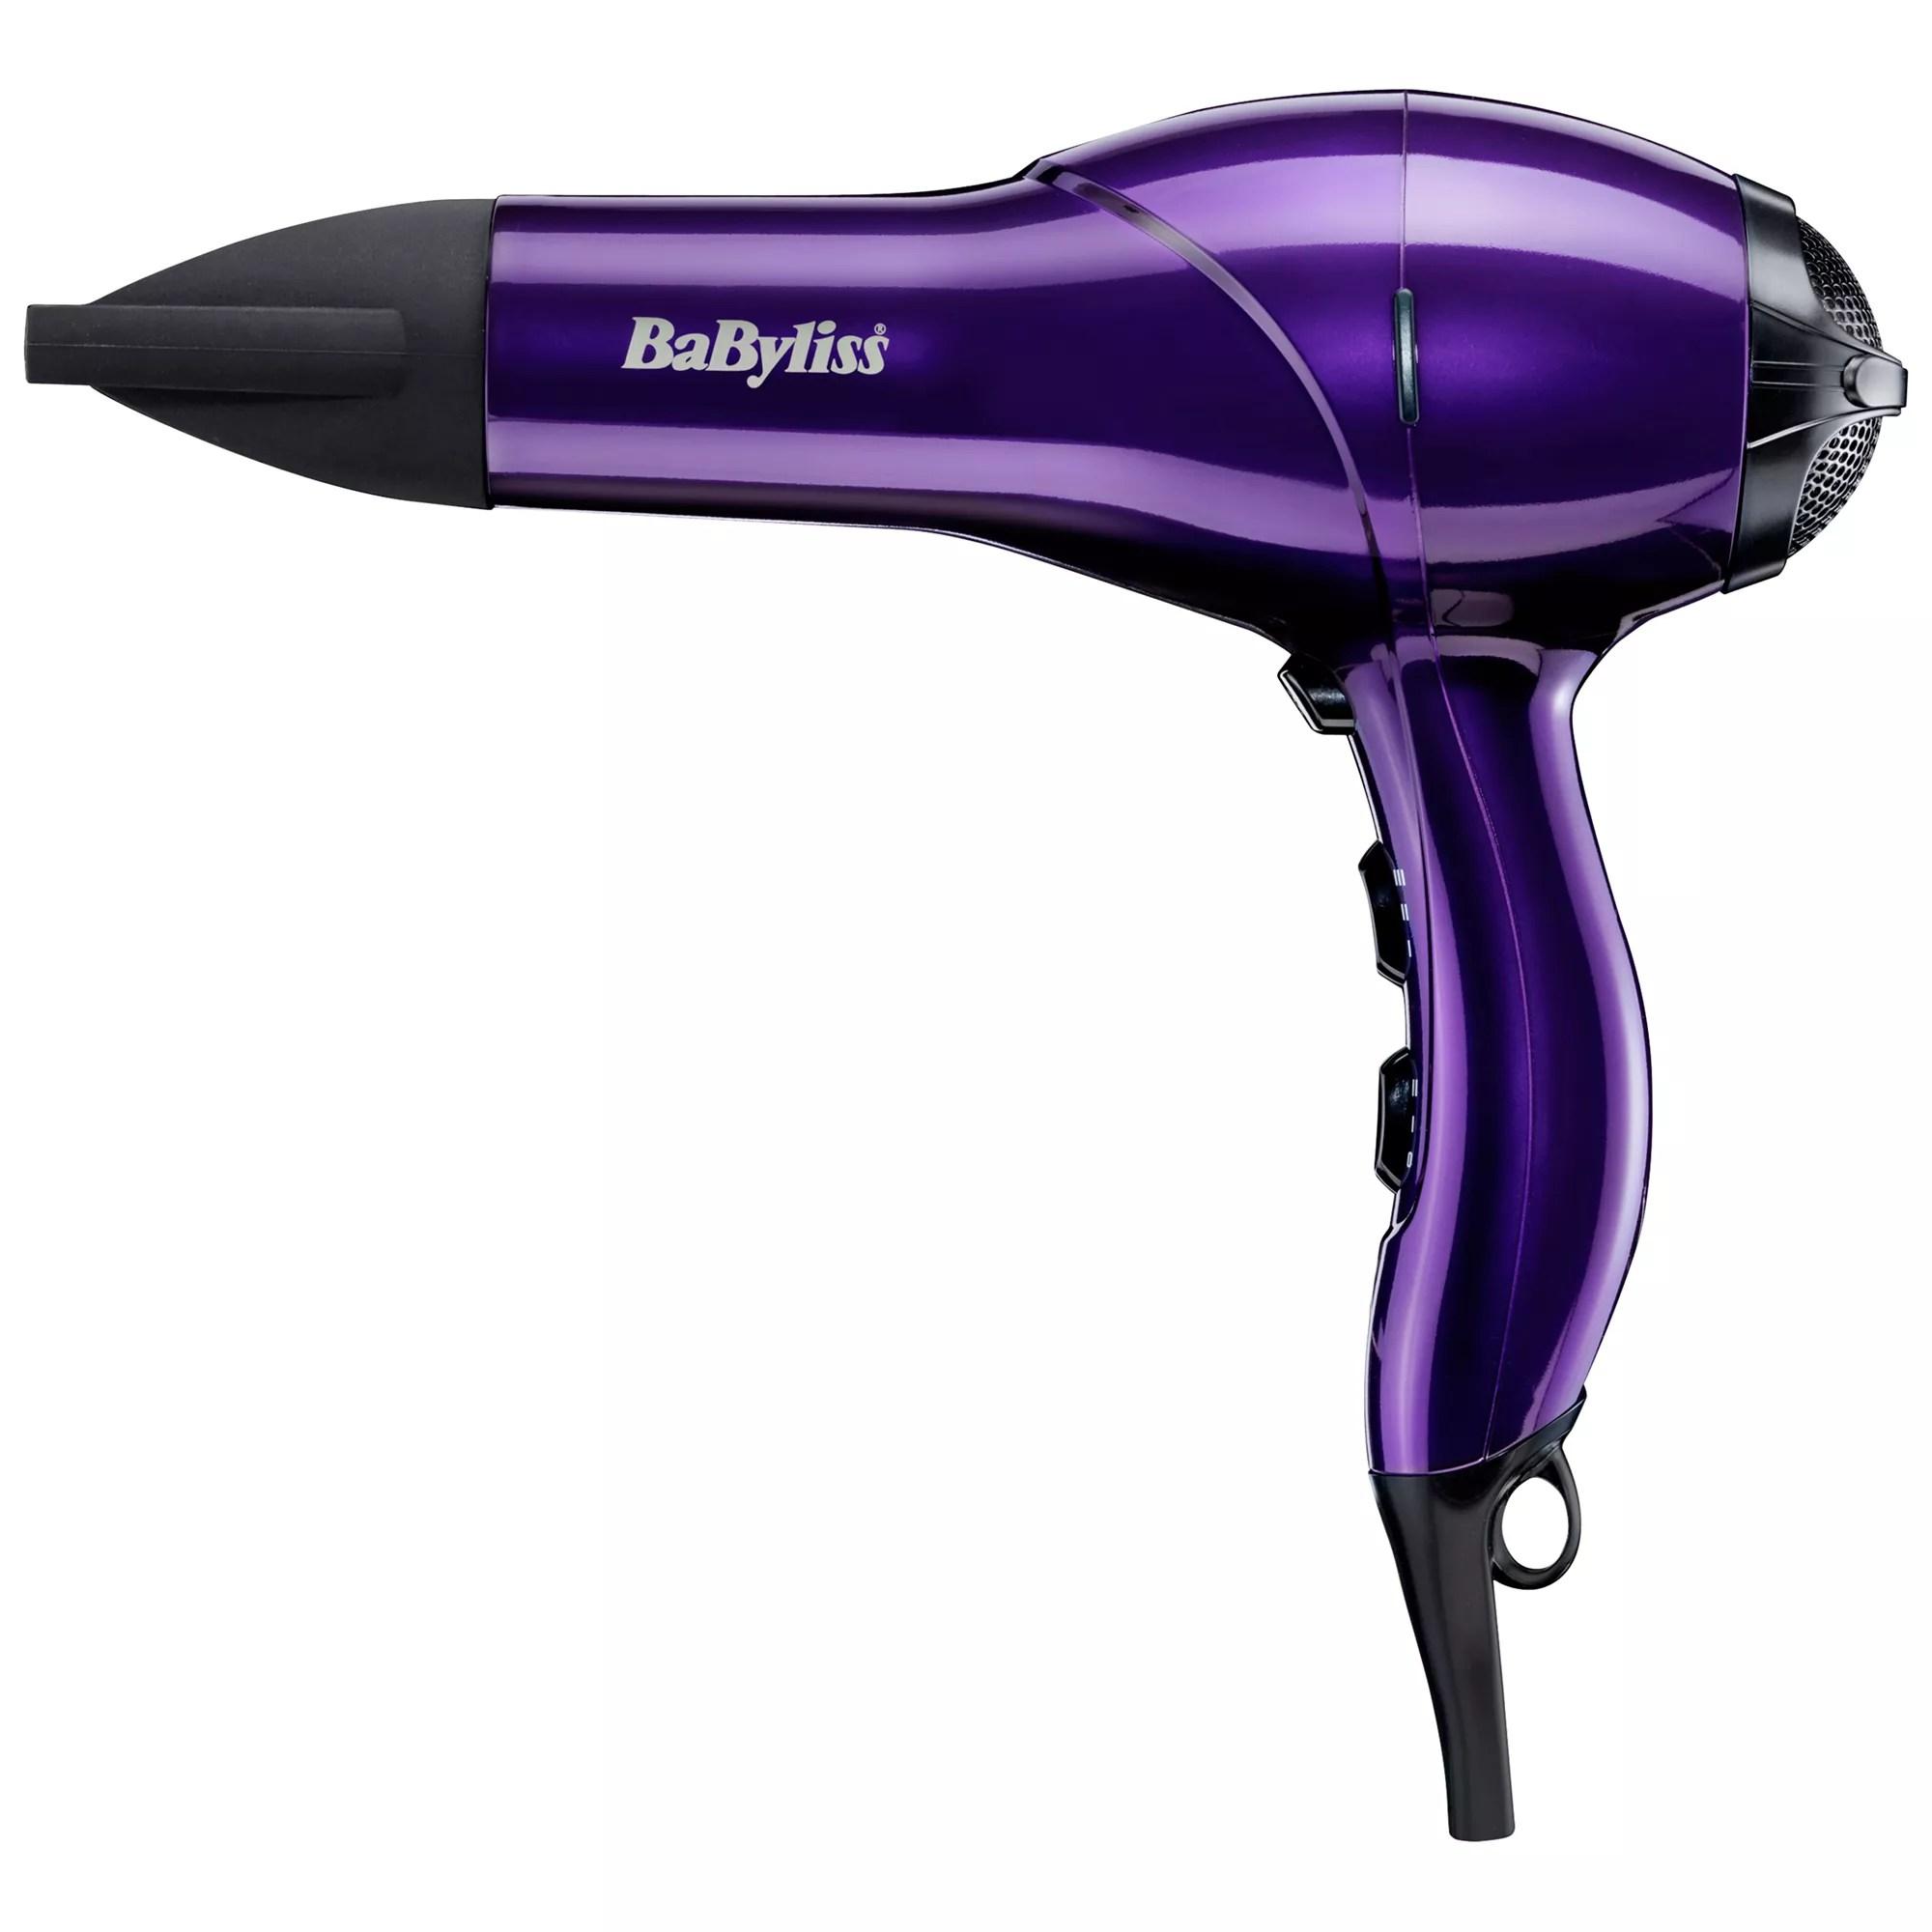 Babyliss ac2100 salon light hair dryer purple online at johnlewis com